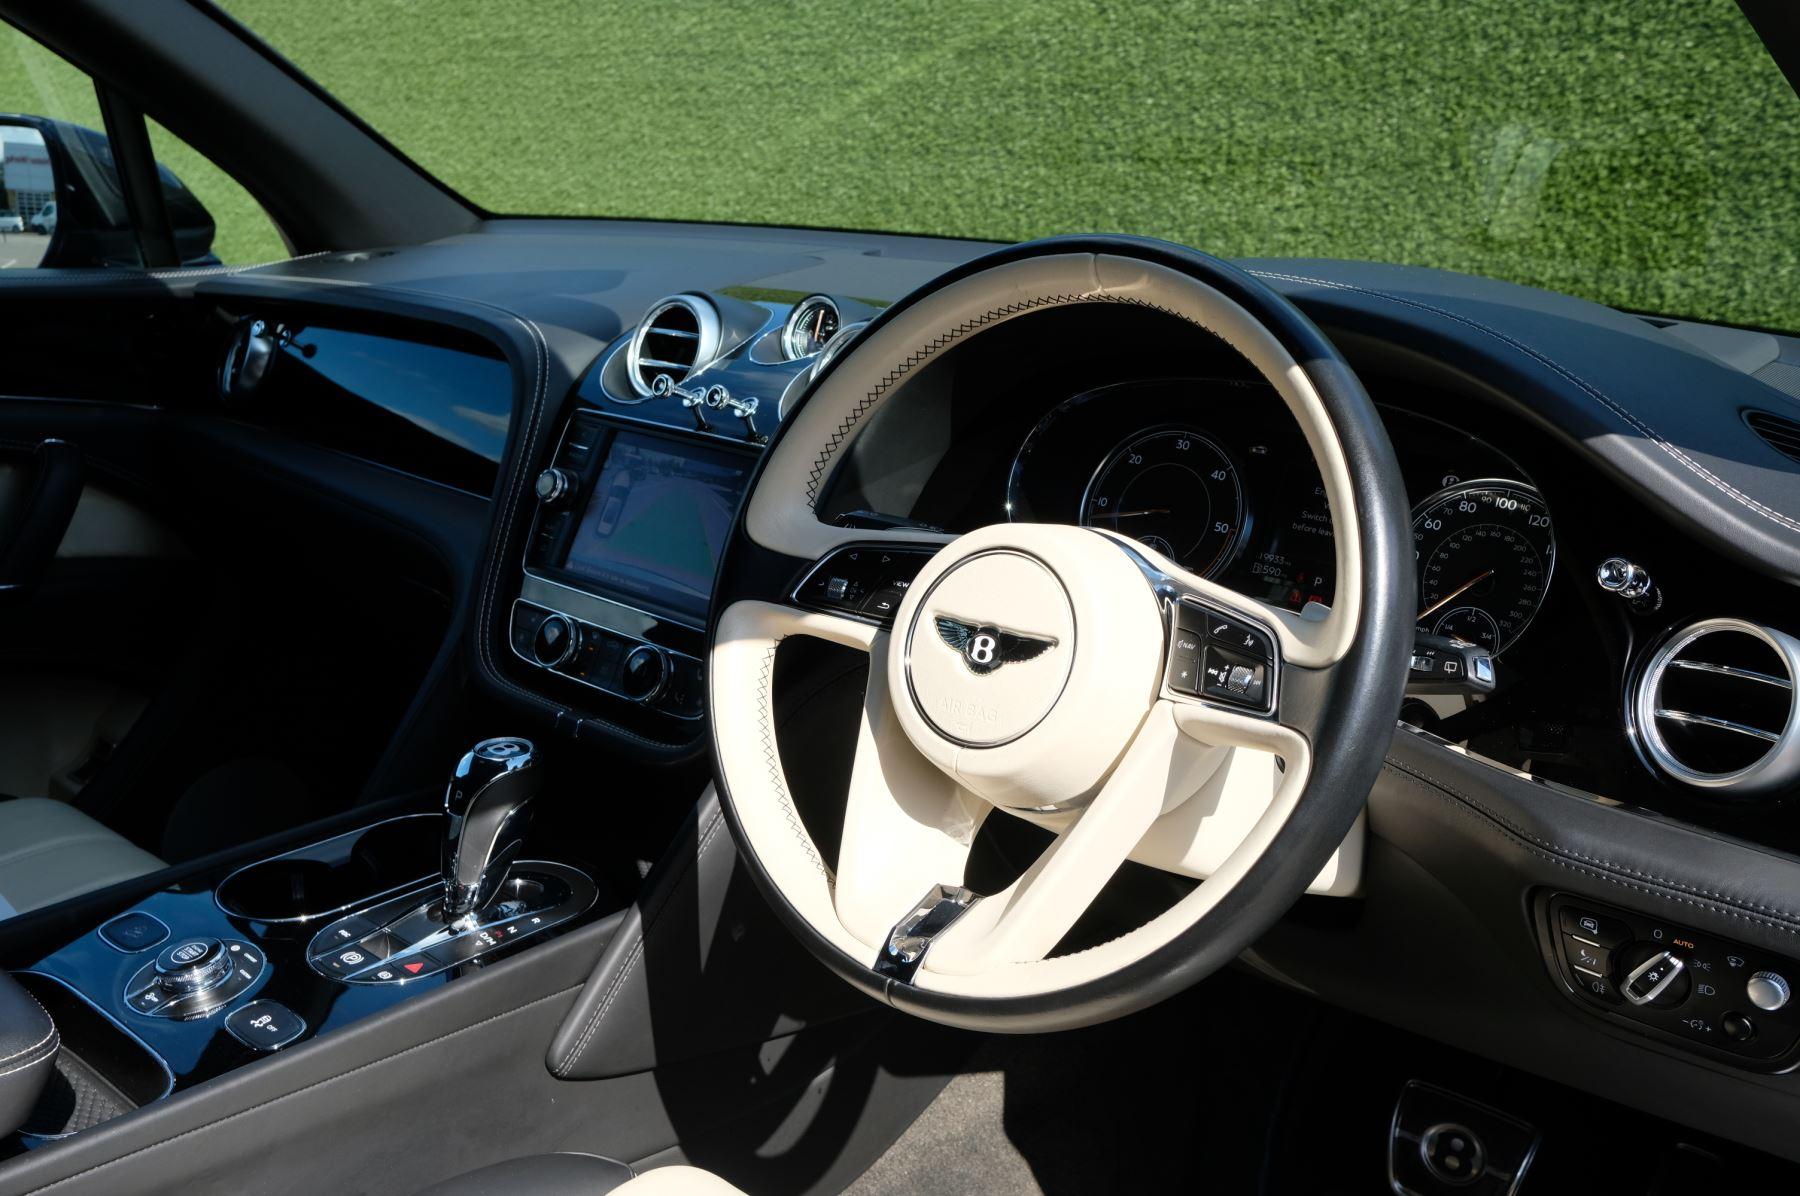 Bentley Bentayga 4.0 V8 5dr image 11